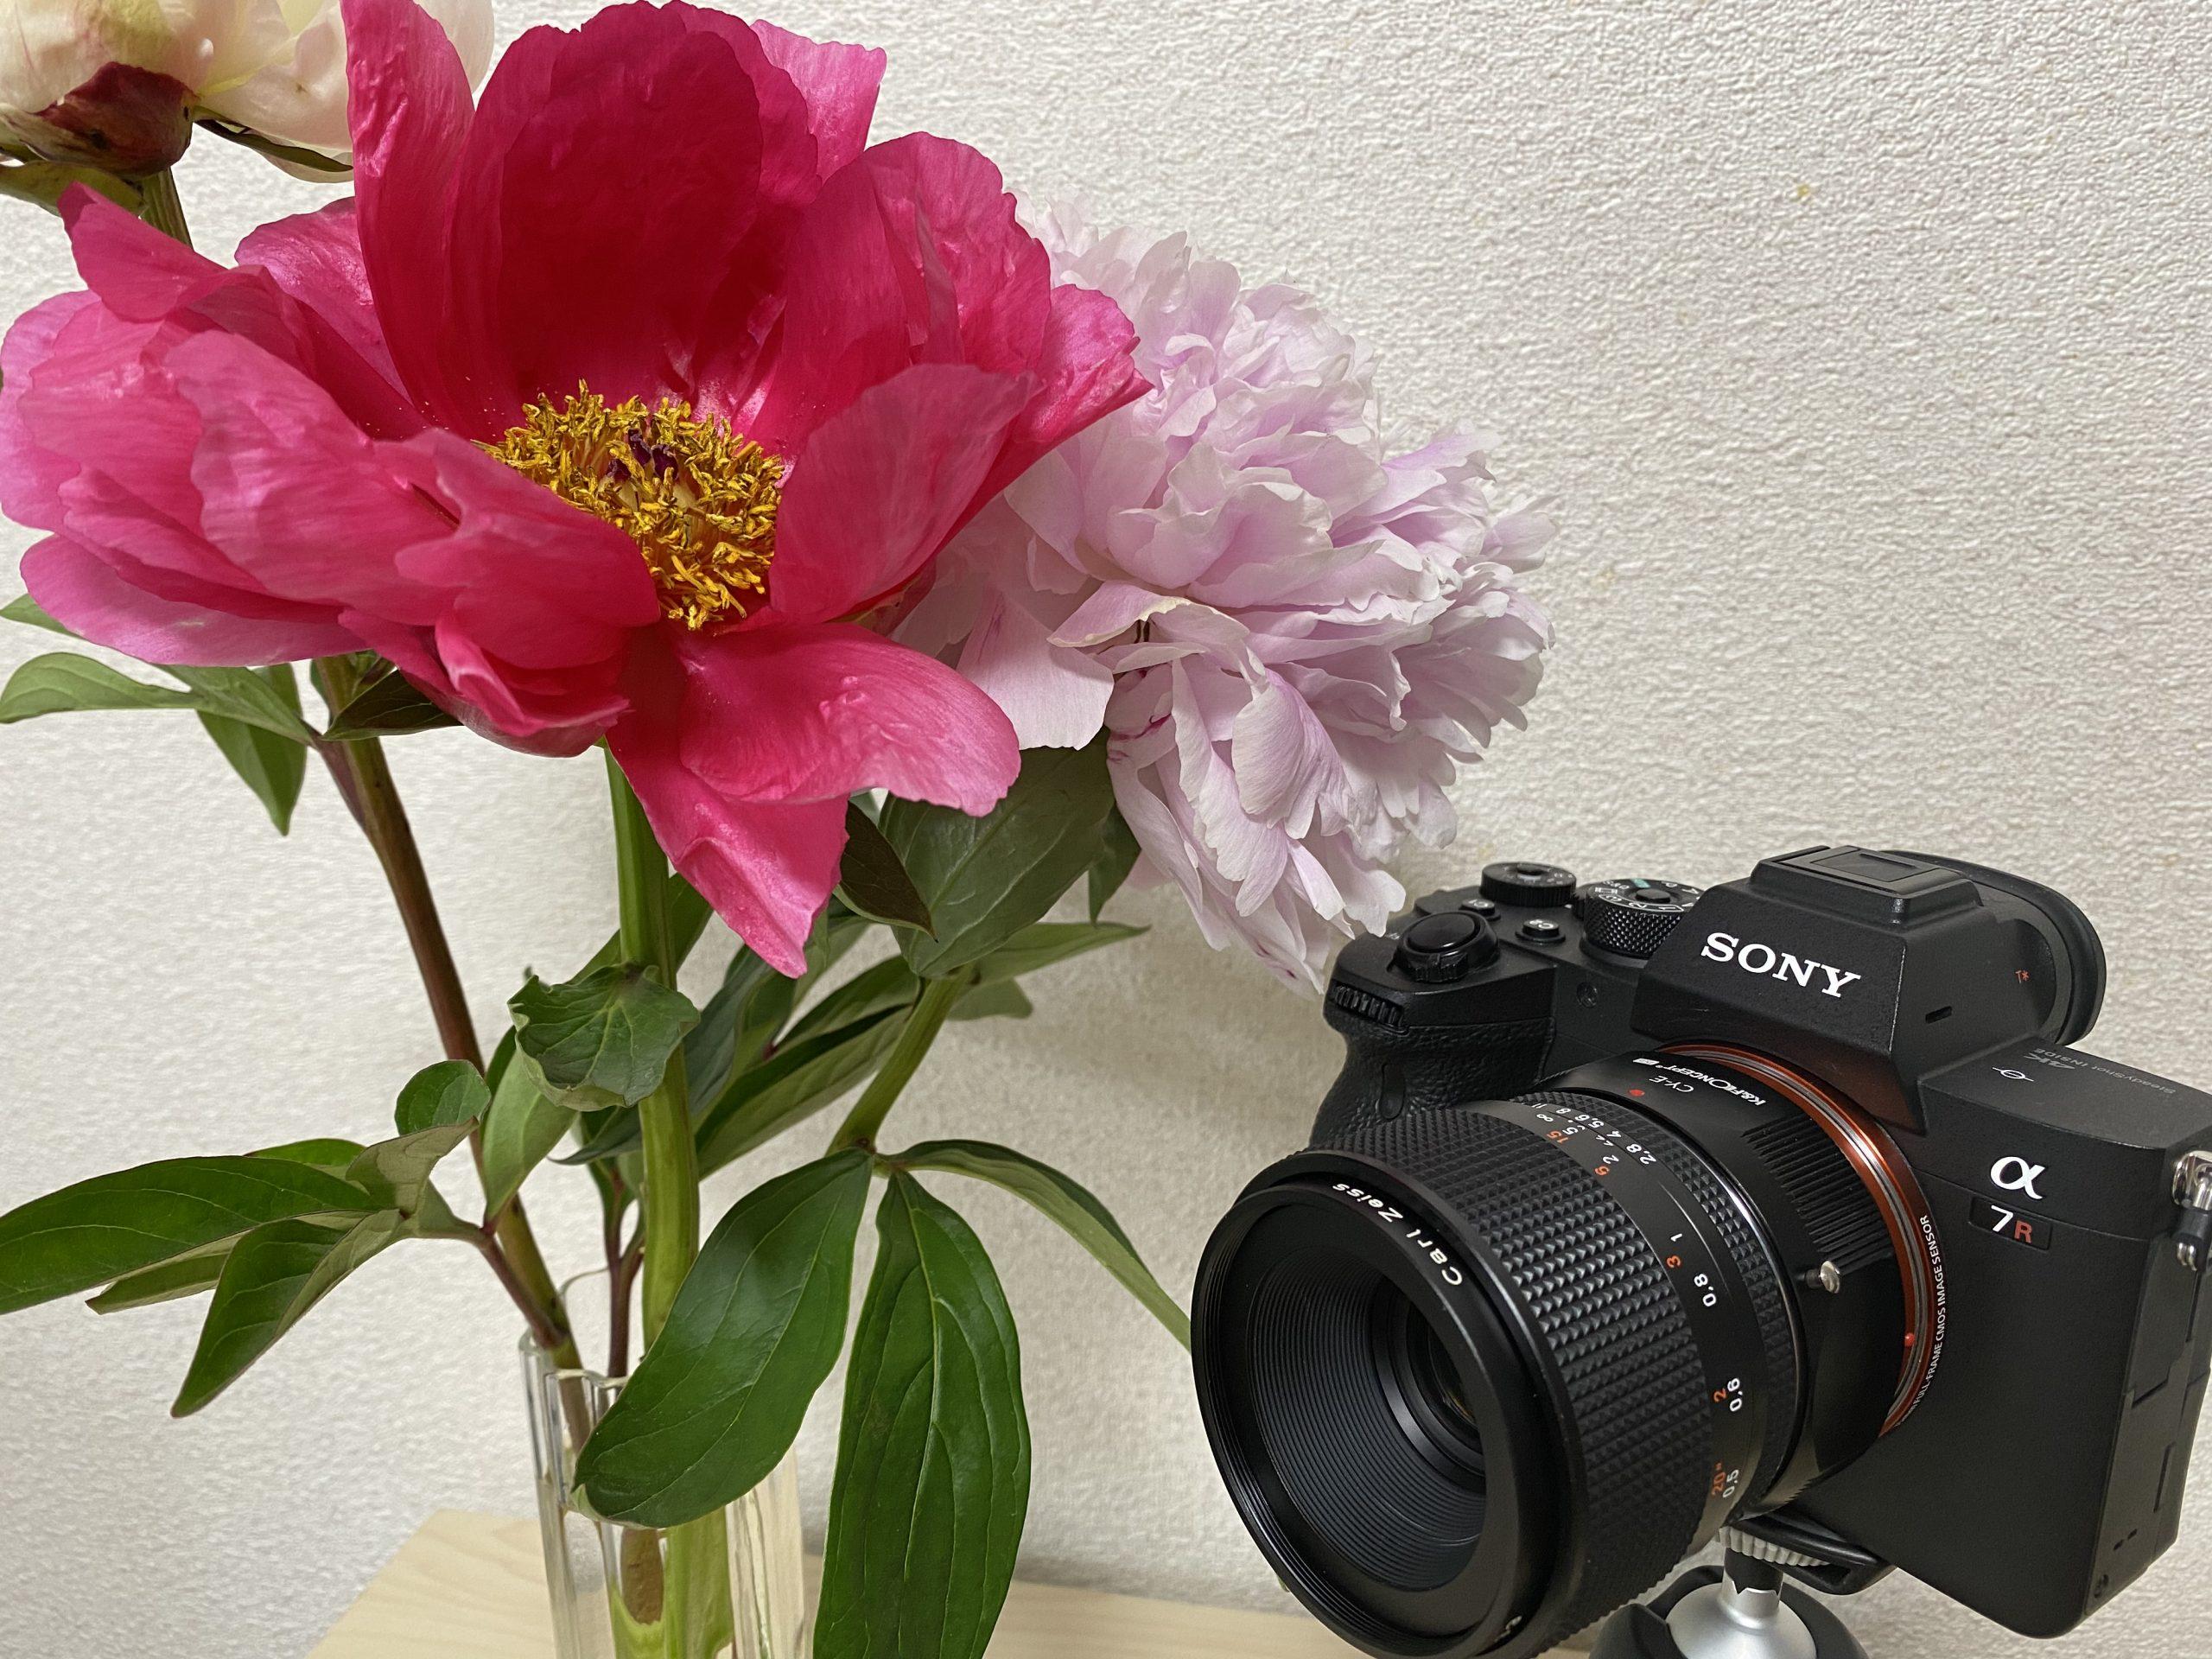 【SONY】a7RIV × CONTAX  Makro-Planar T*60mm F2.8 C MM で動画撮影